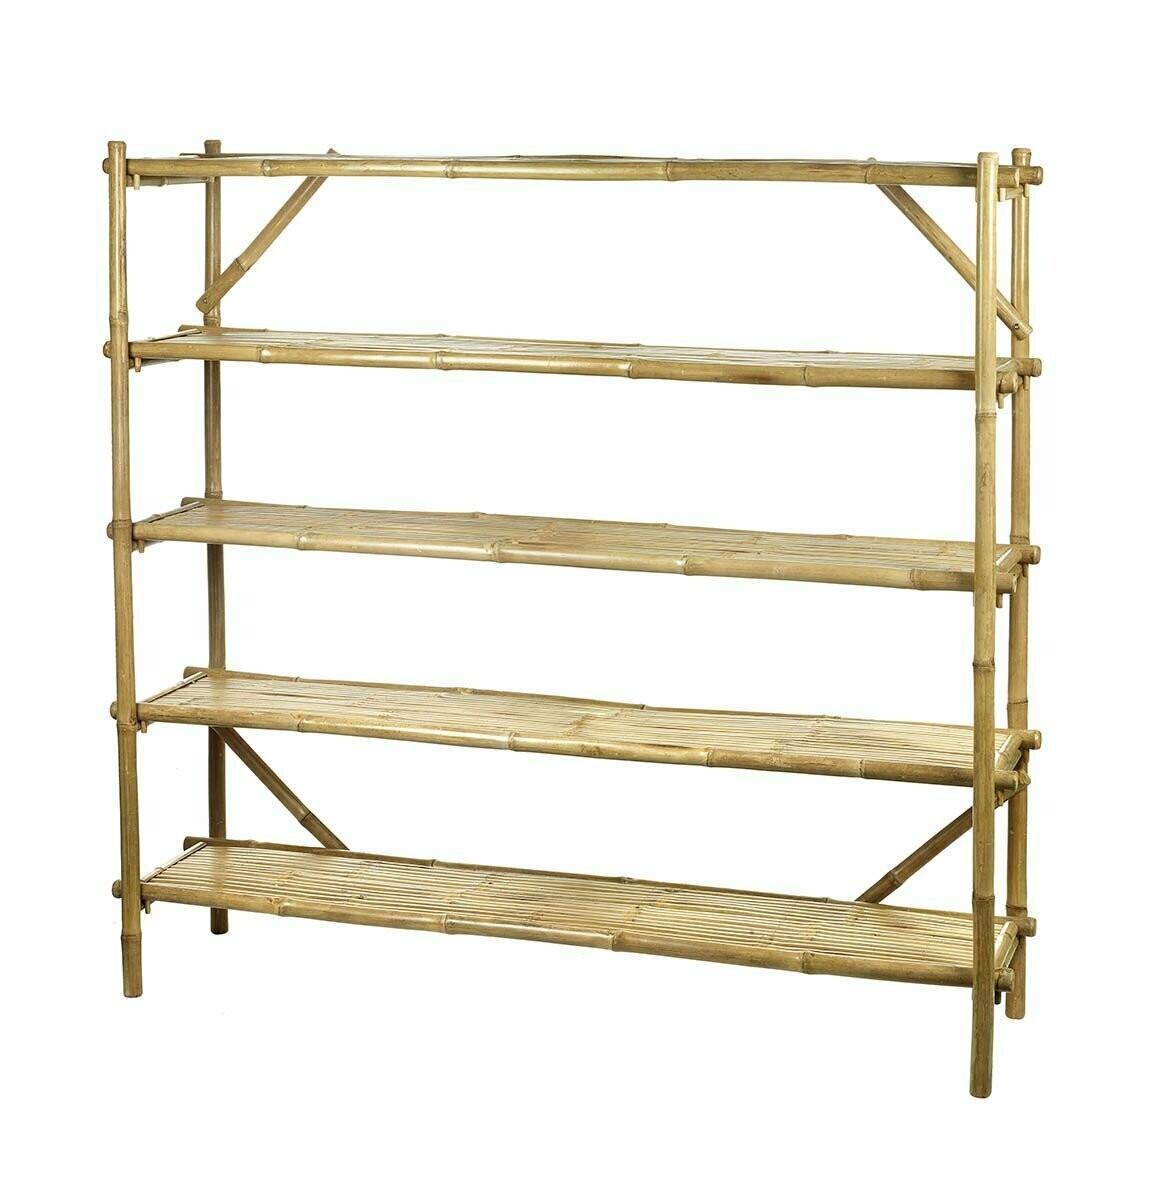 Bamboo Shelving unit